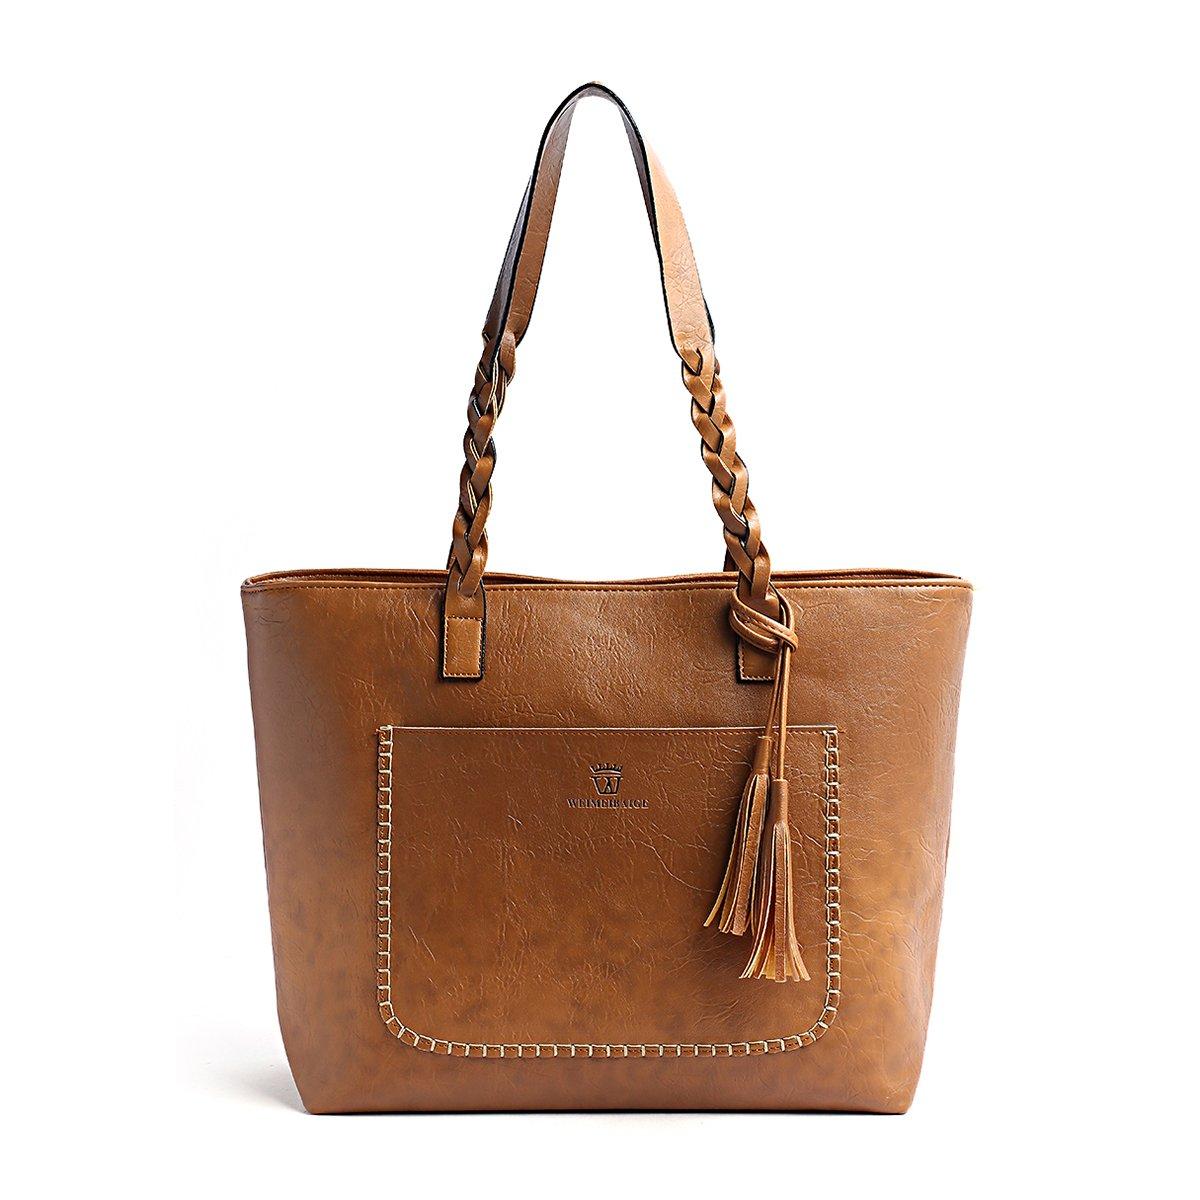 Women Vintage Tote Bag, OURBAG Ladies PU Leather Tote Shoulder Bag Handbag Purse Big Large Brown by OURBAG